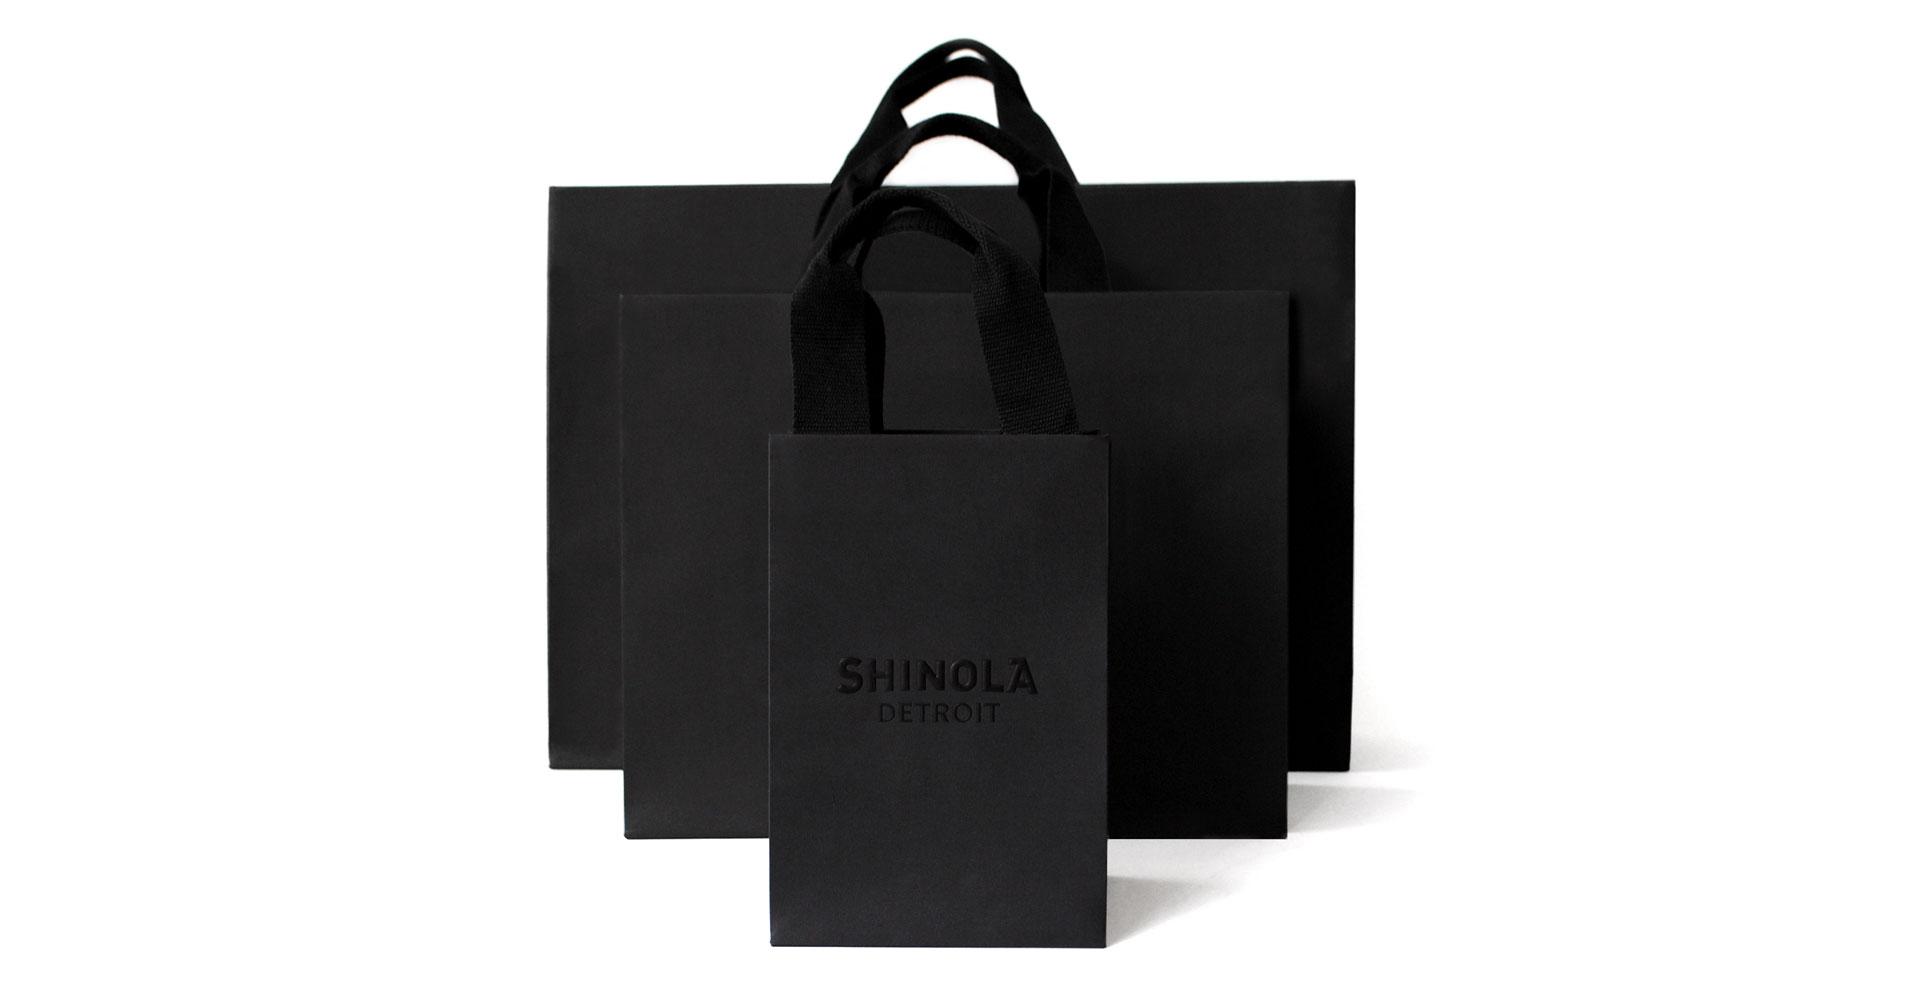 Creative_Retail_Packaging_Custom_Luxury_Design_Shinola_03.jpg